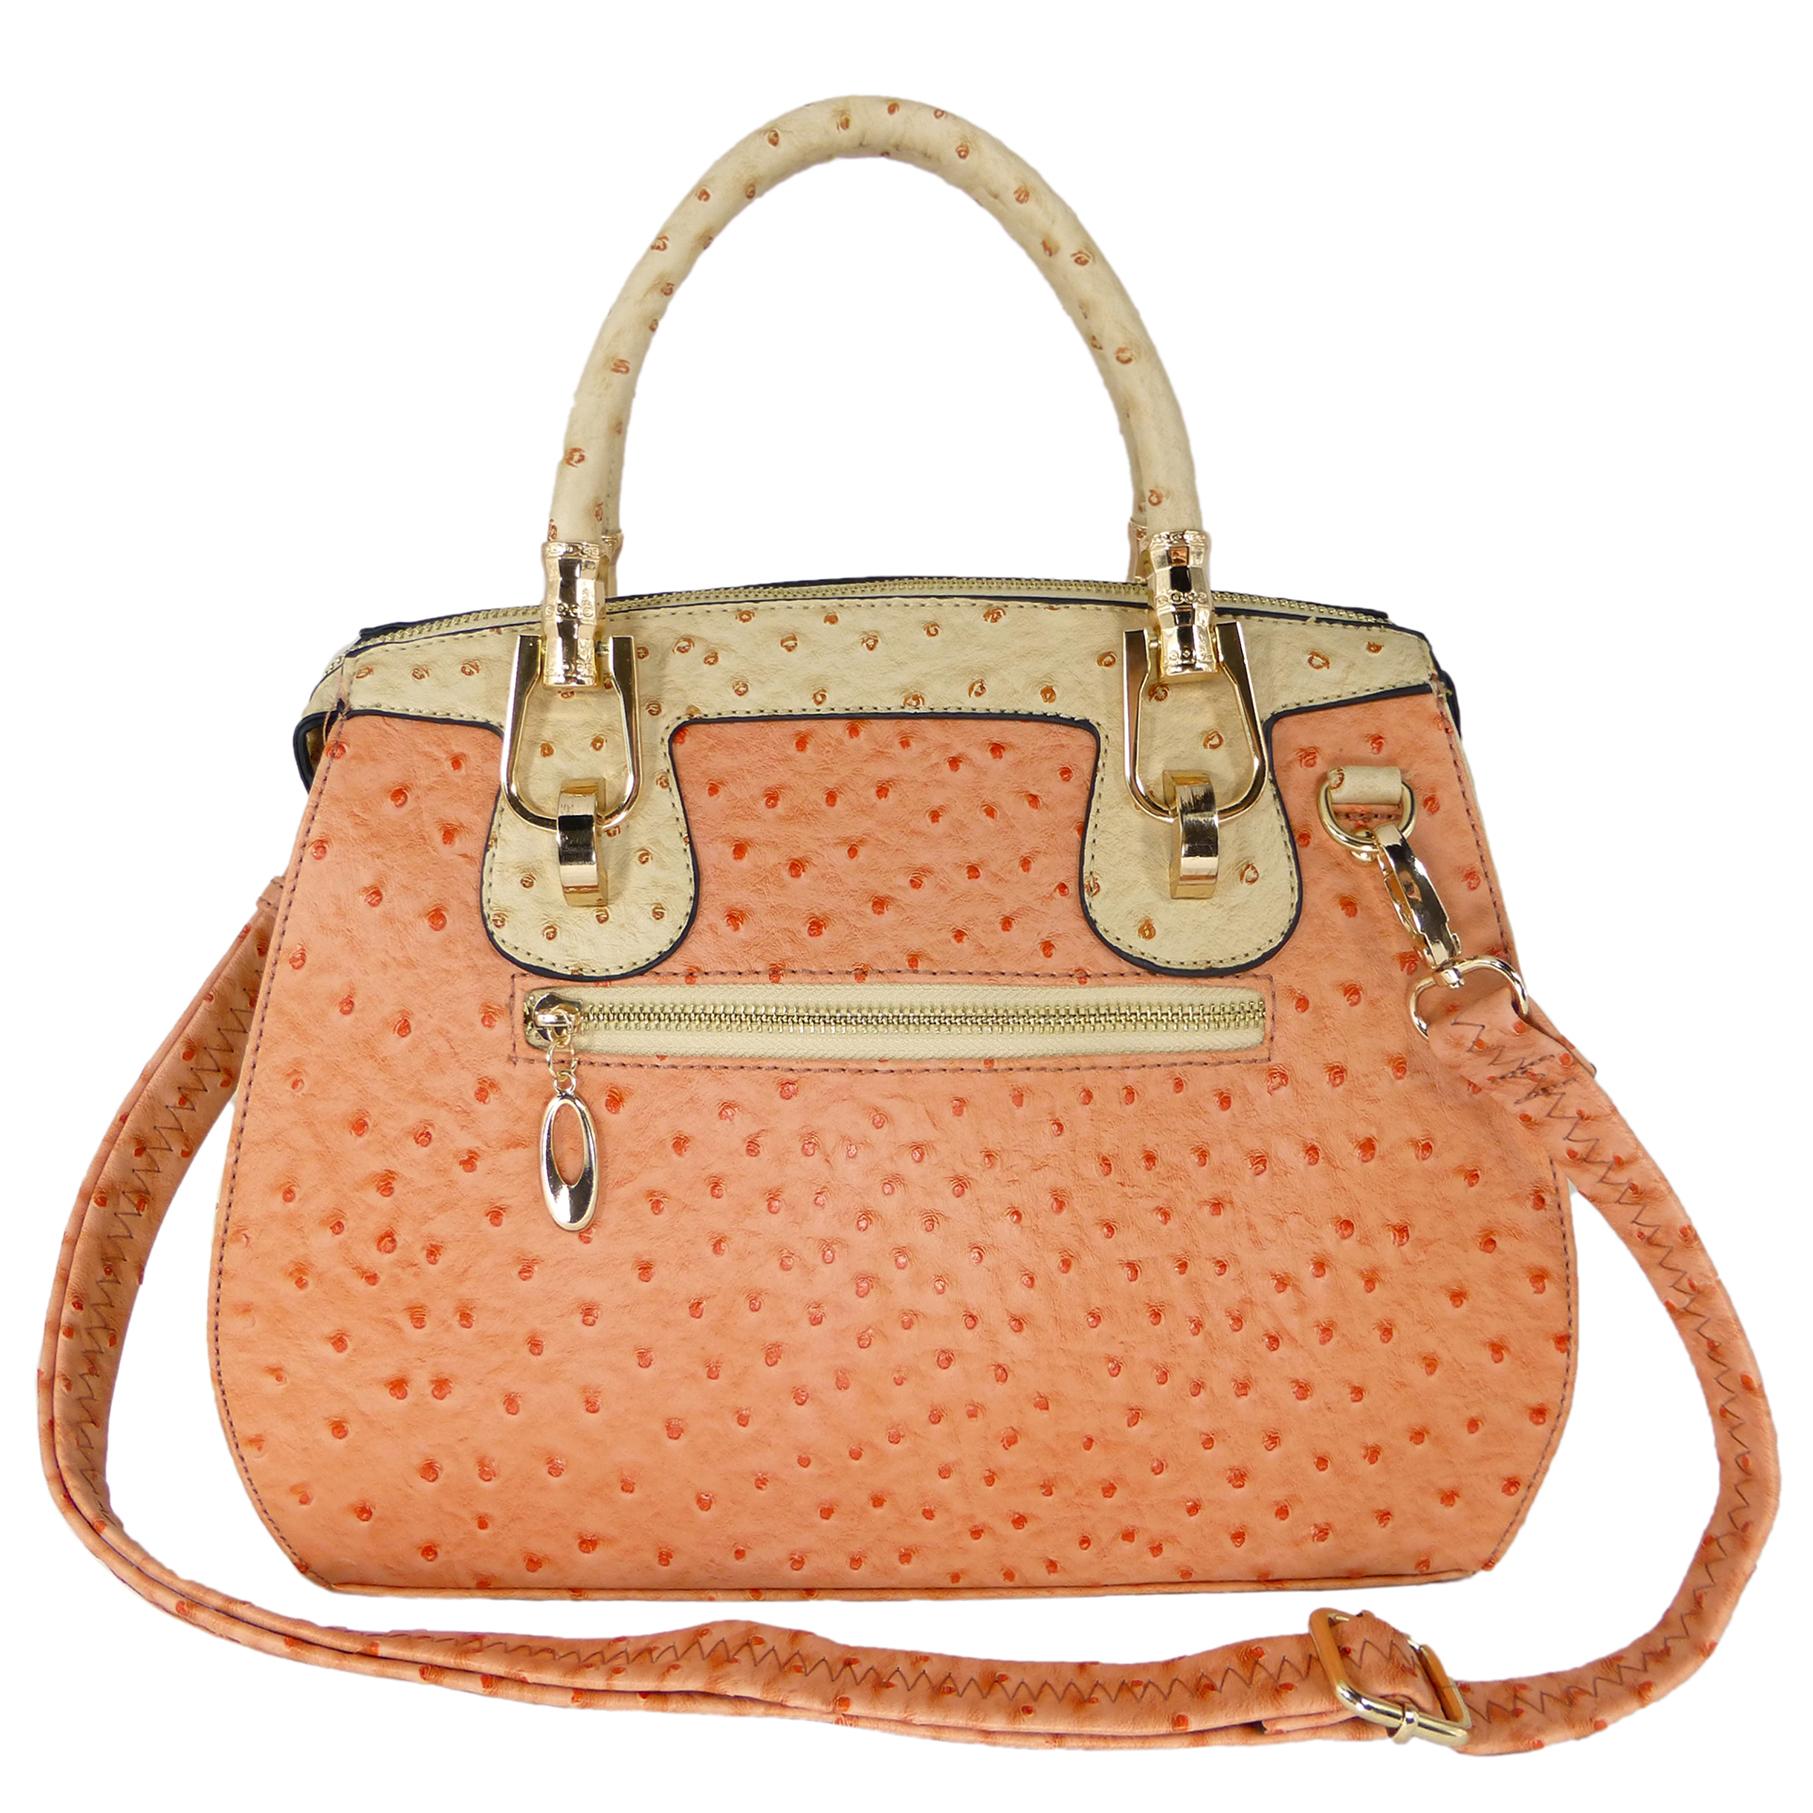 MARISSA Pink Doctor Style Handbag back